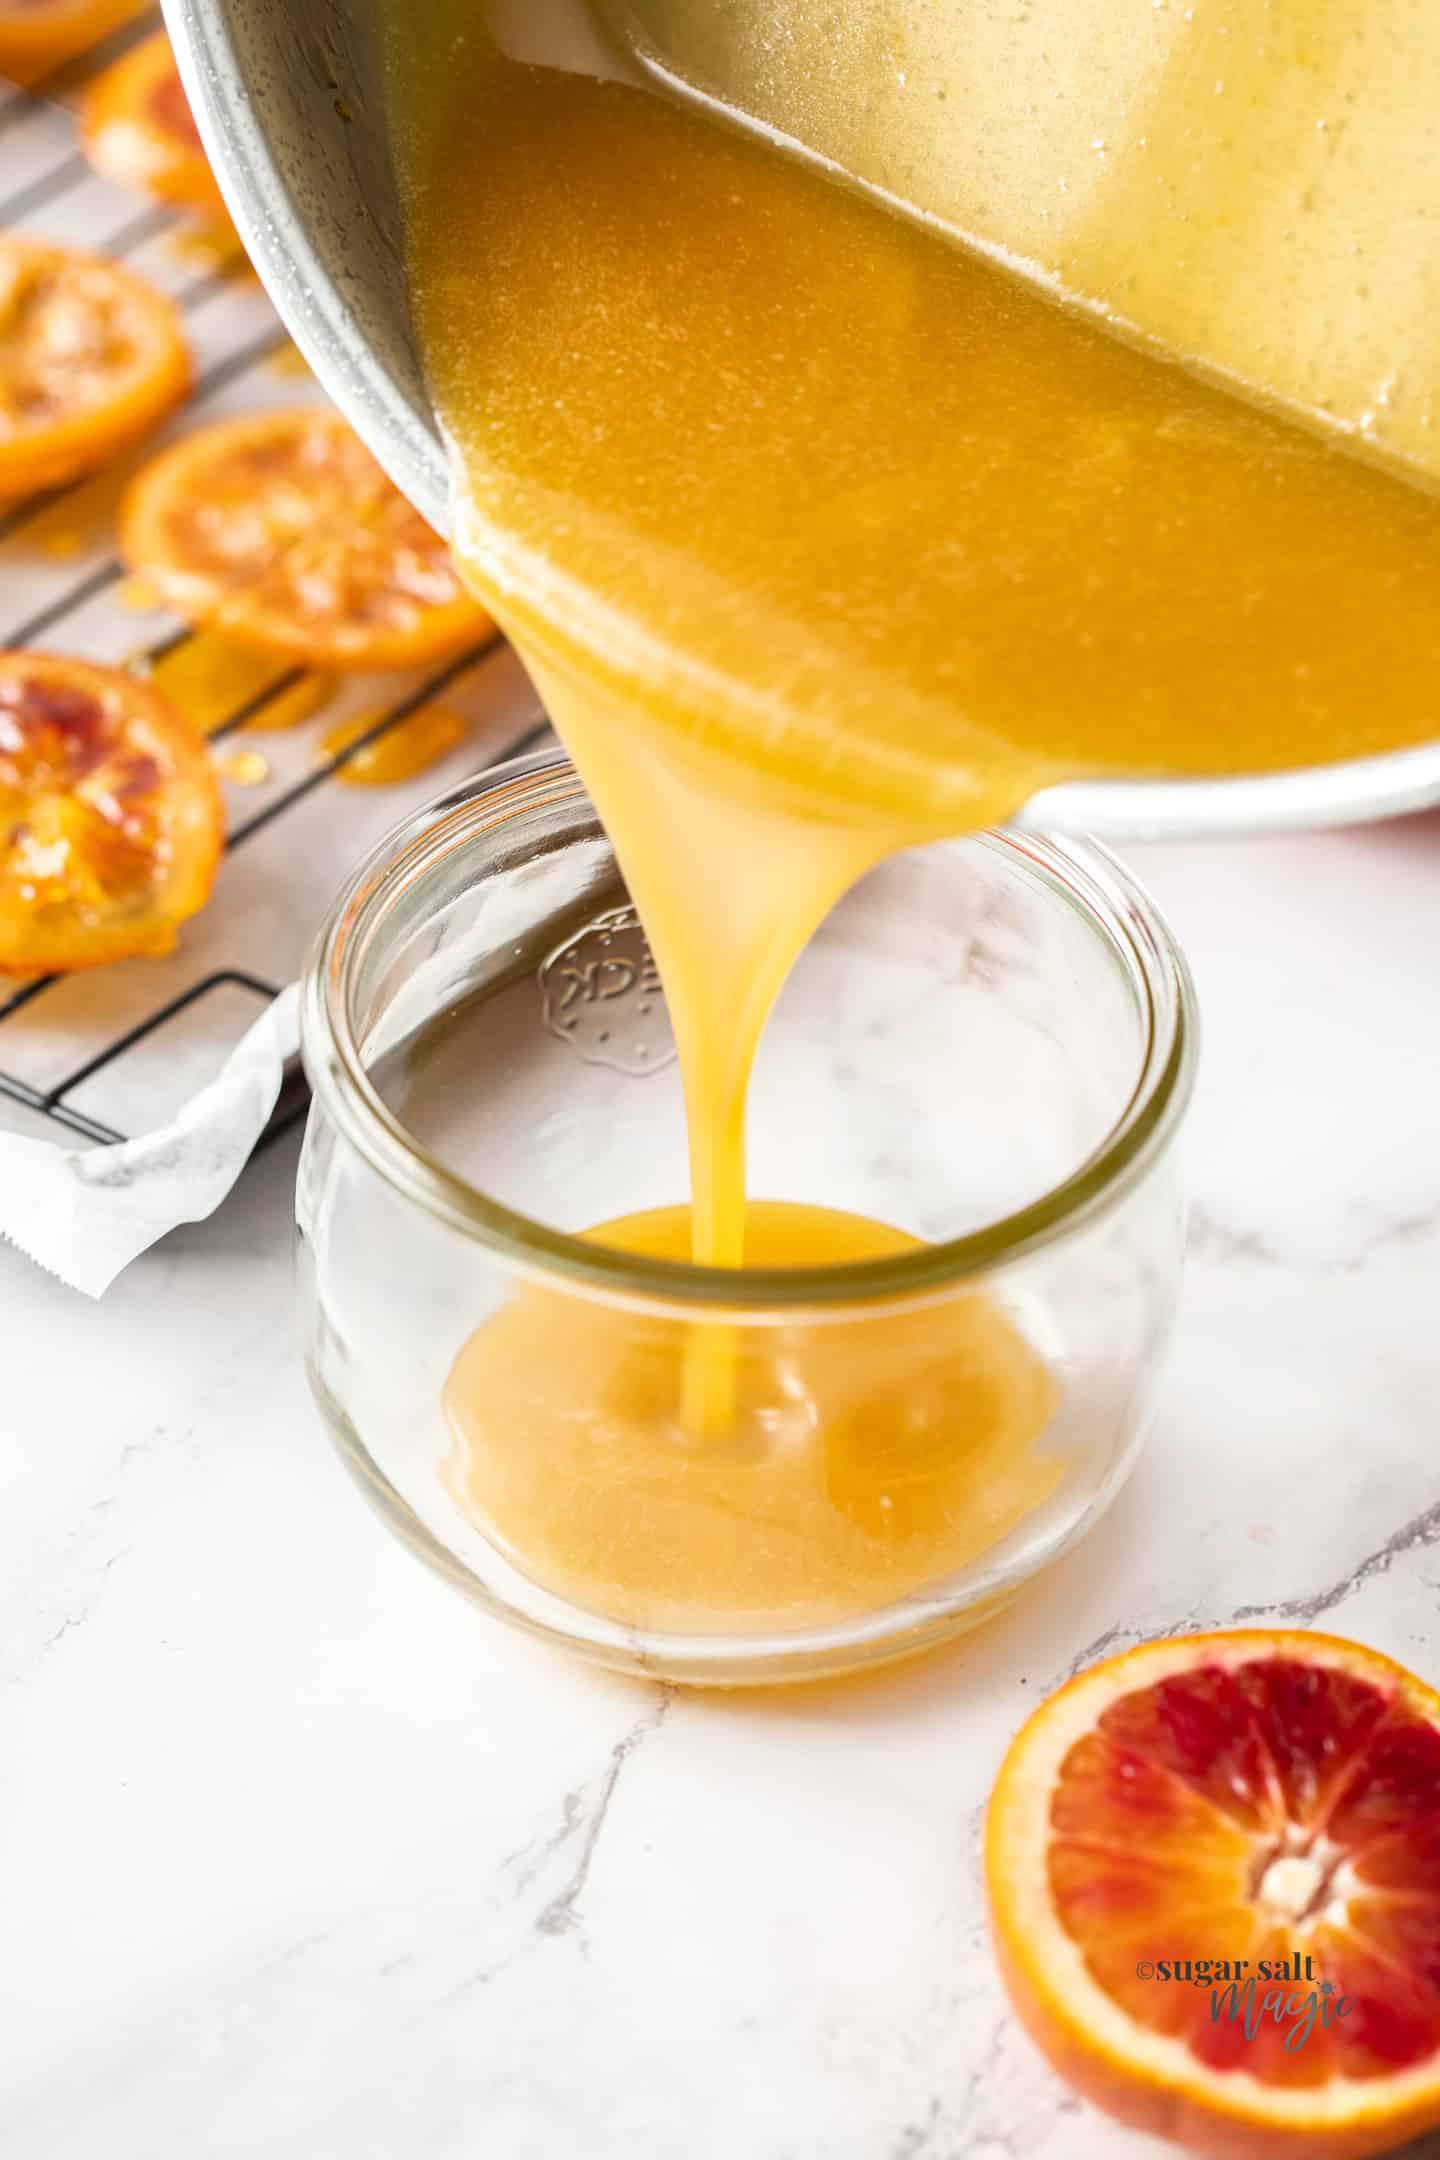 Orange caramel sauce being poured into a glass jar.